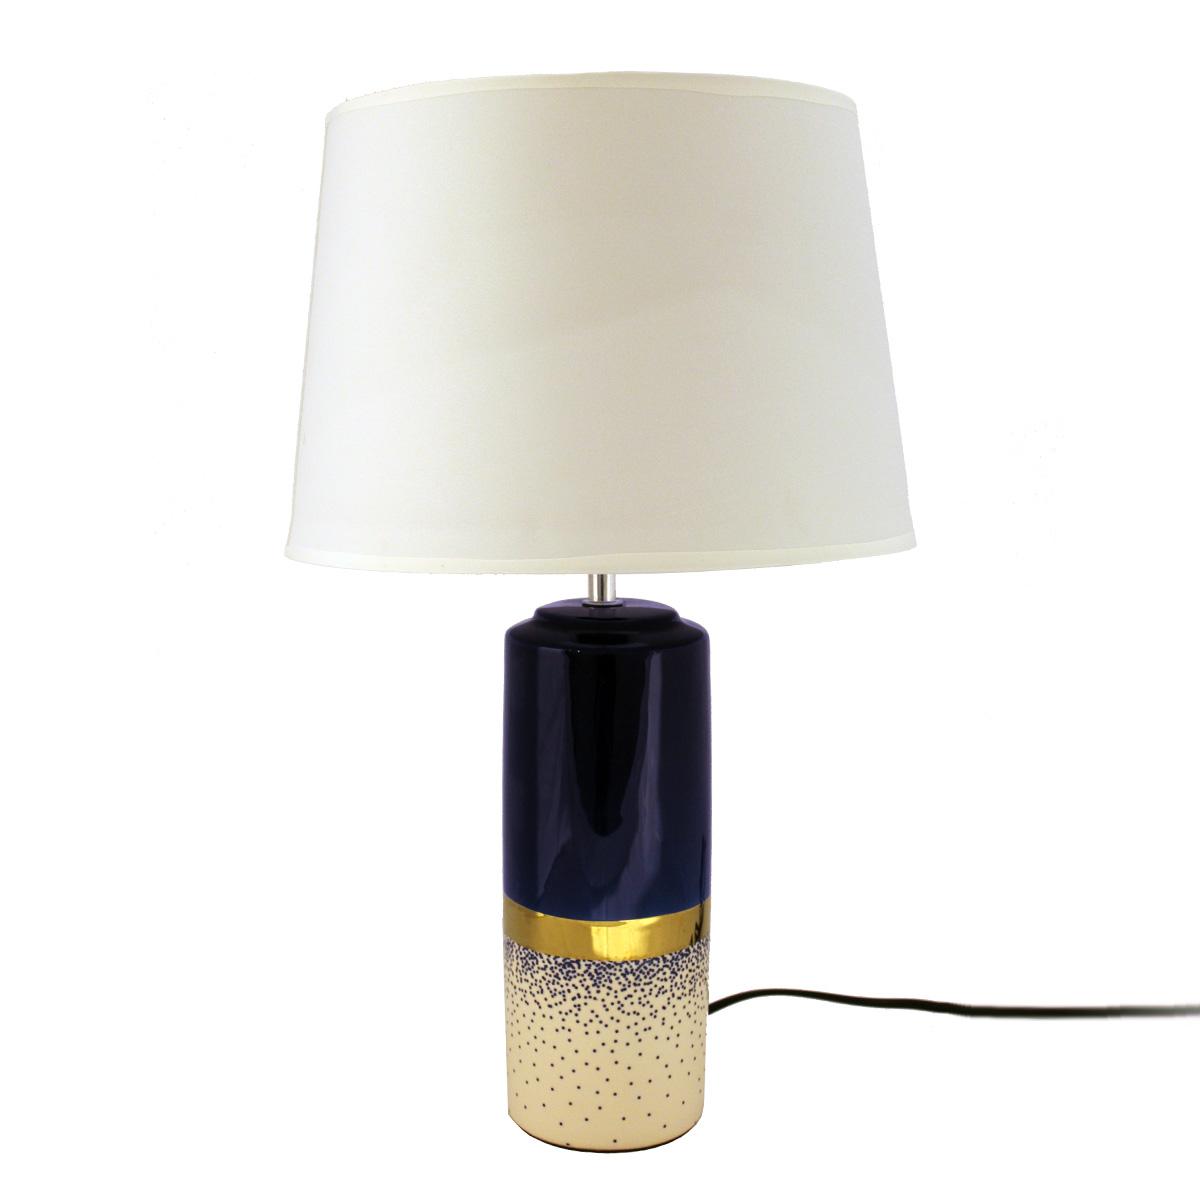 Stona lampa MUS-183